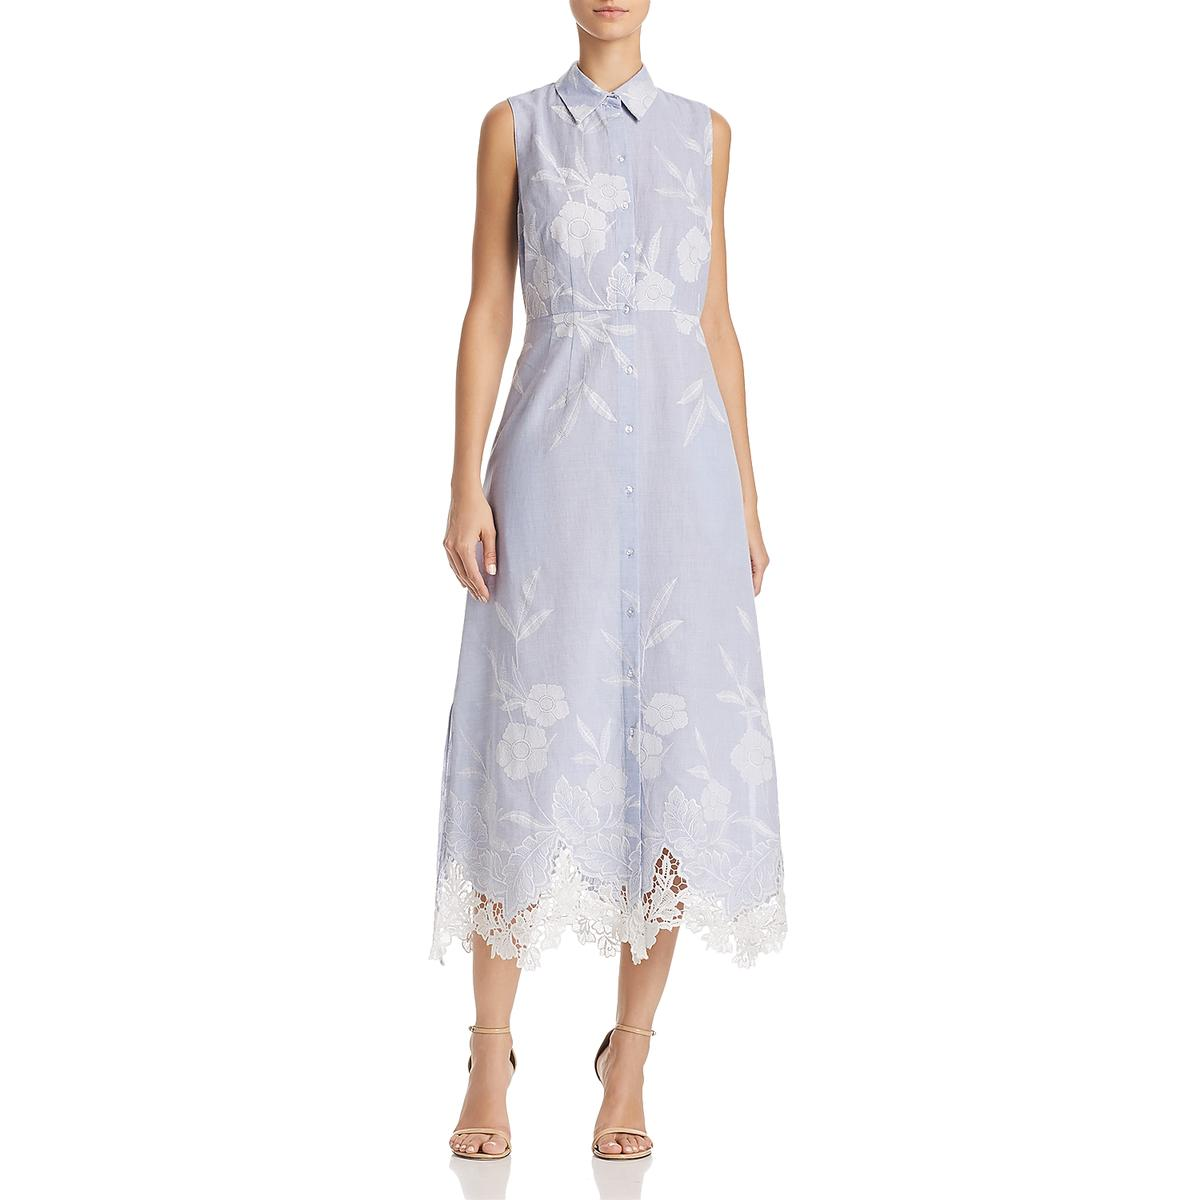 8f7f19c55c1b7 Tahari Millie Womens Embroidered Knee-Length Shirtdress